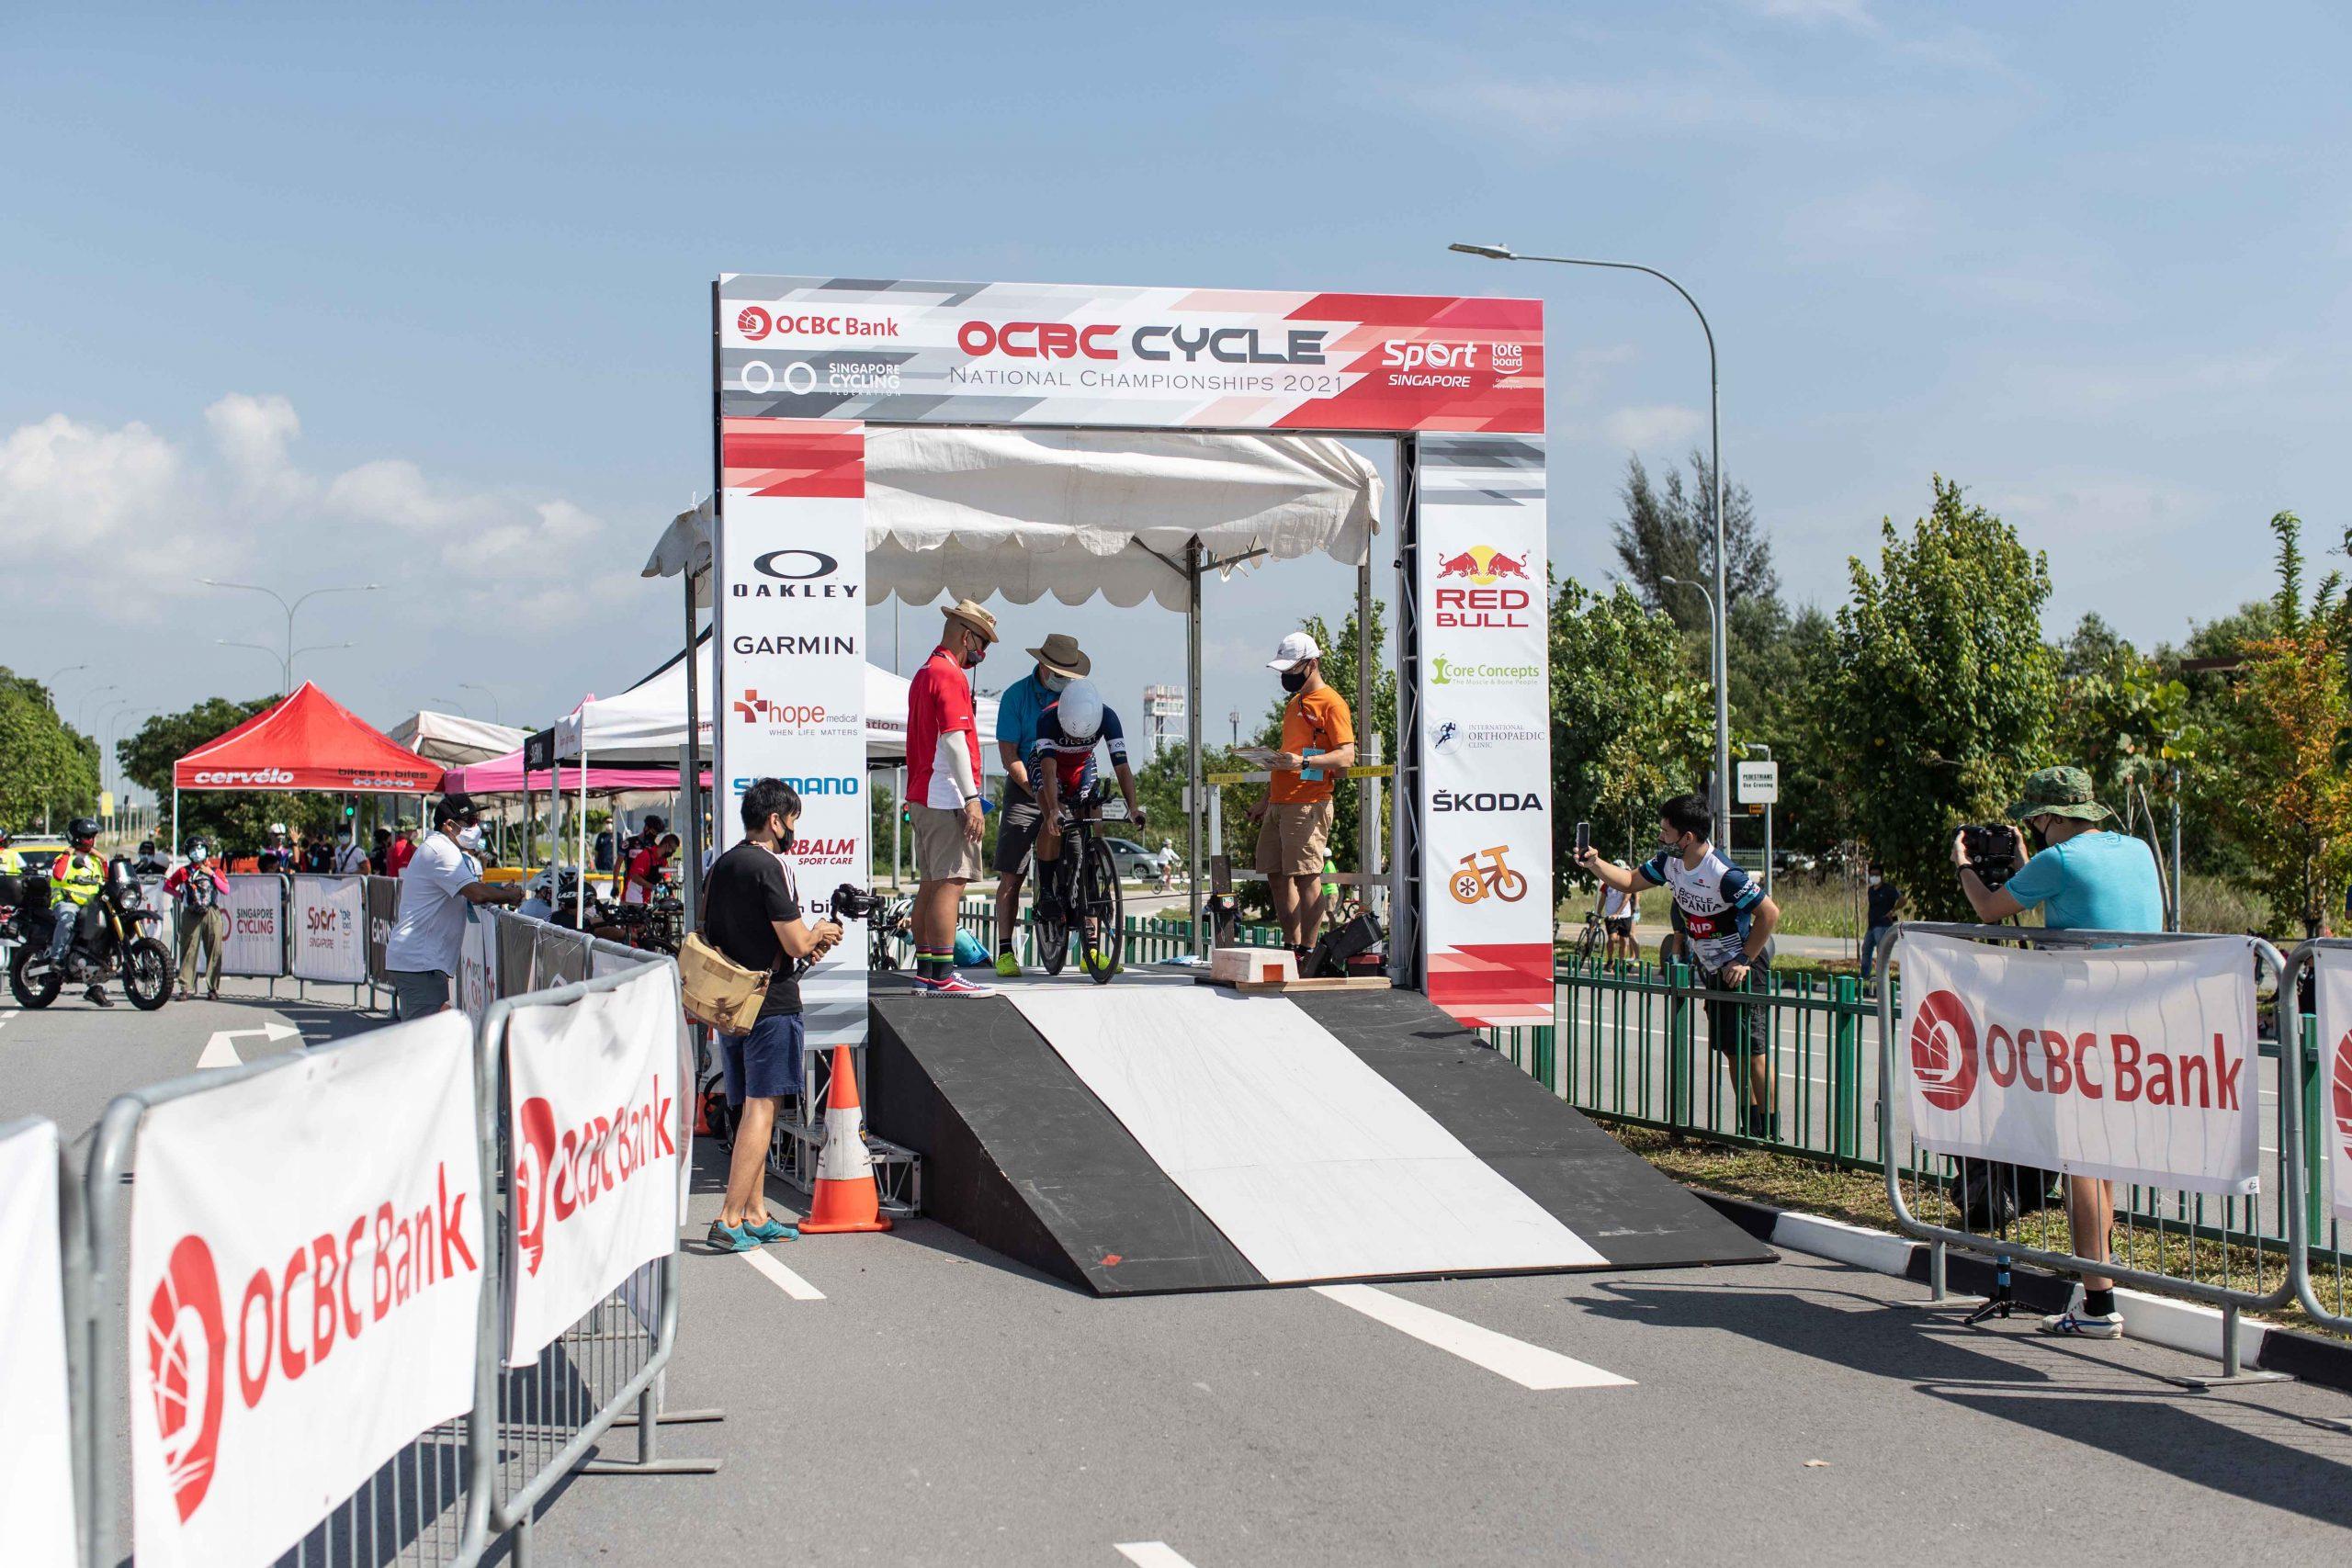 OCBC Cycle, National Championships